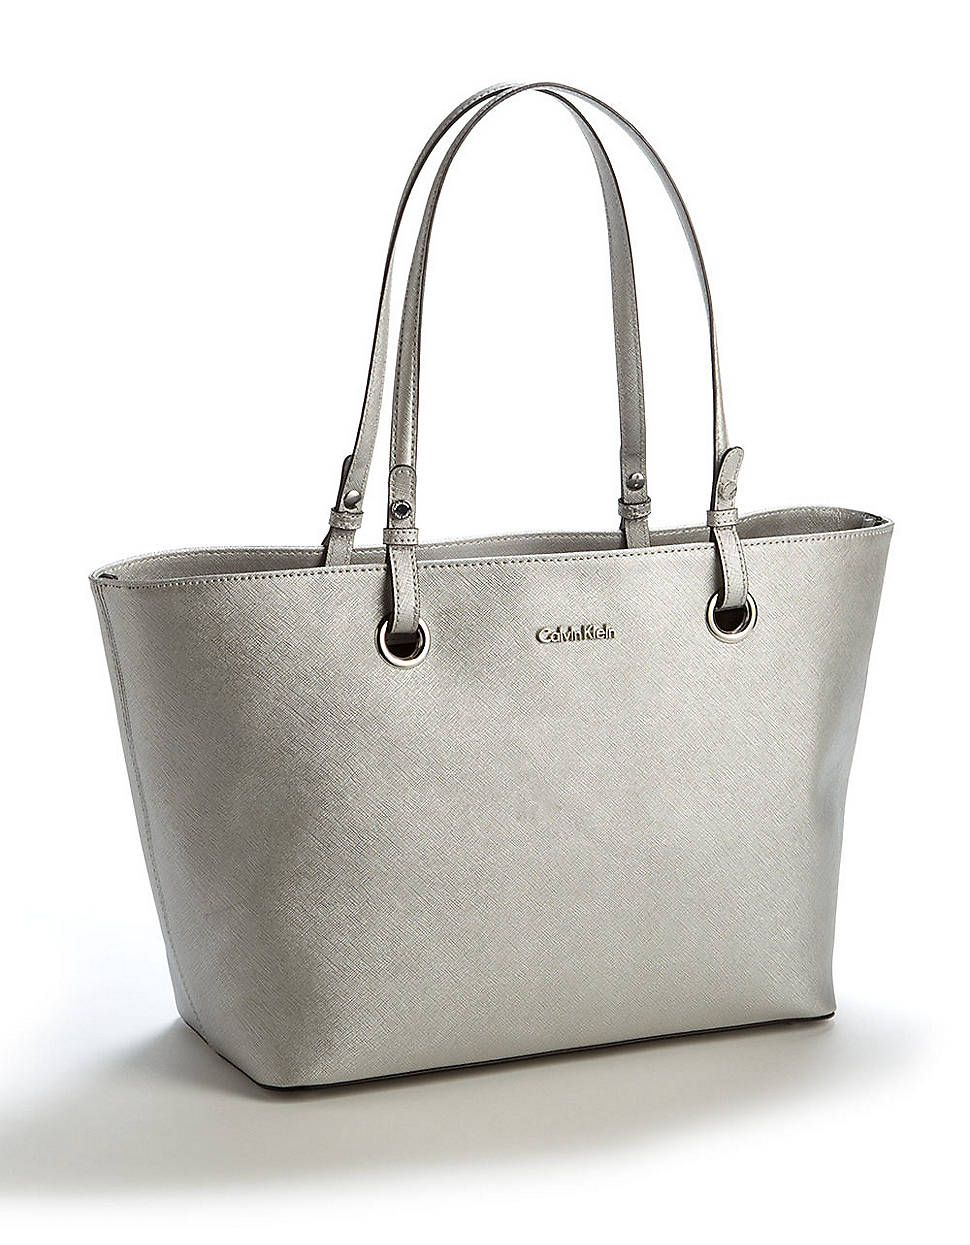 88fe0bdf5d6 Calvin Klein Leather Tote Bag in Metallic - Lyst